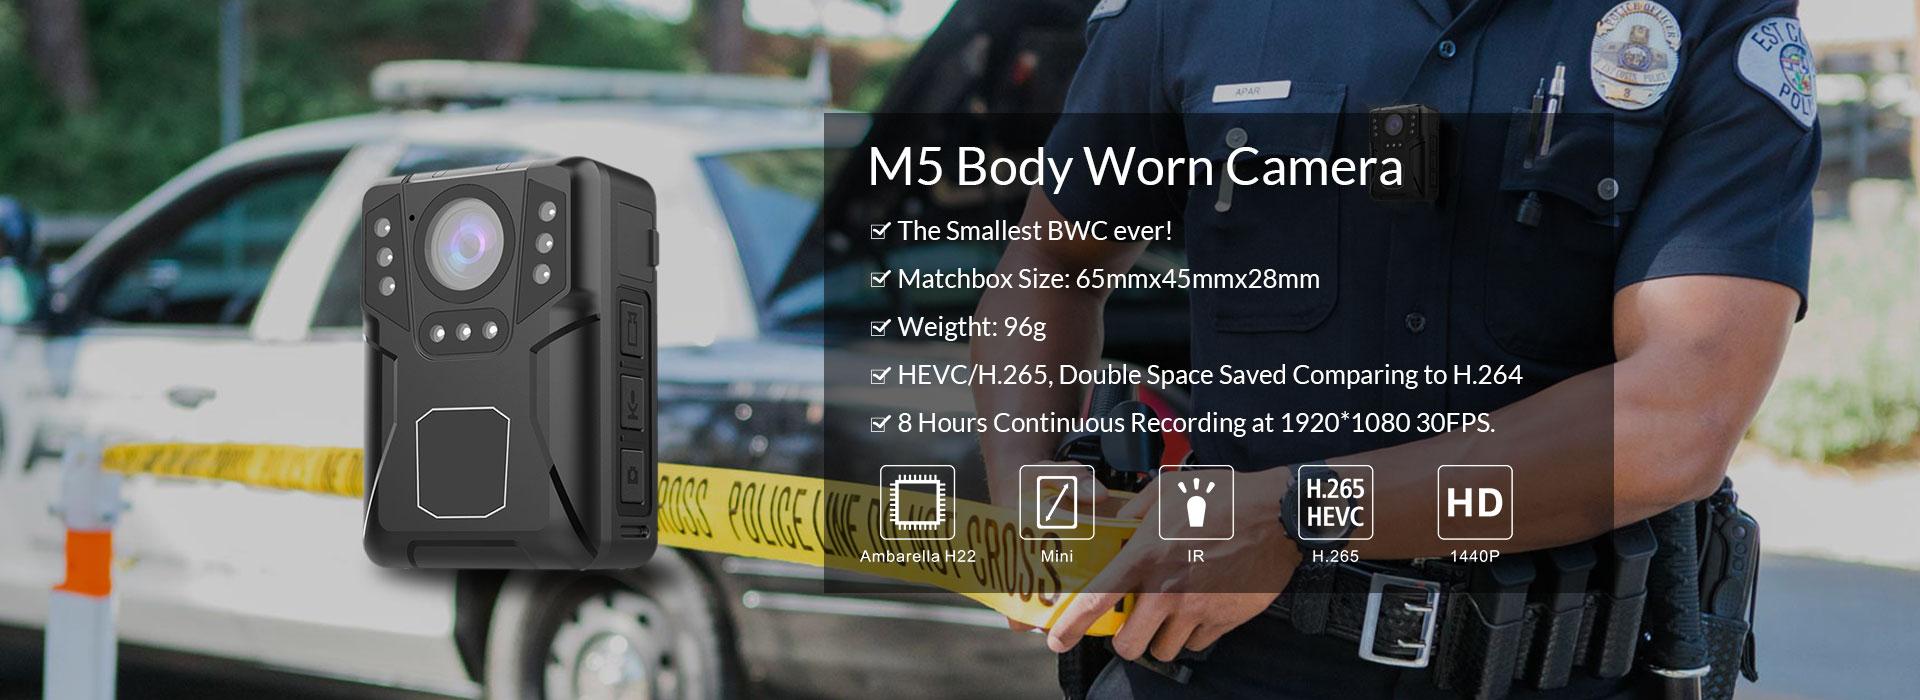 M5 Body Worn Camera